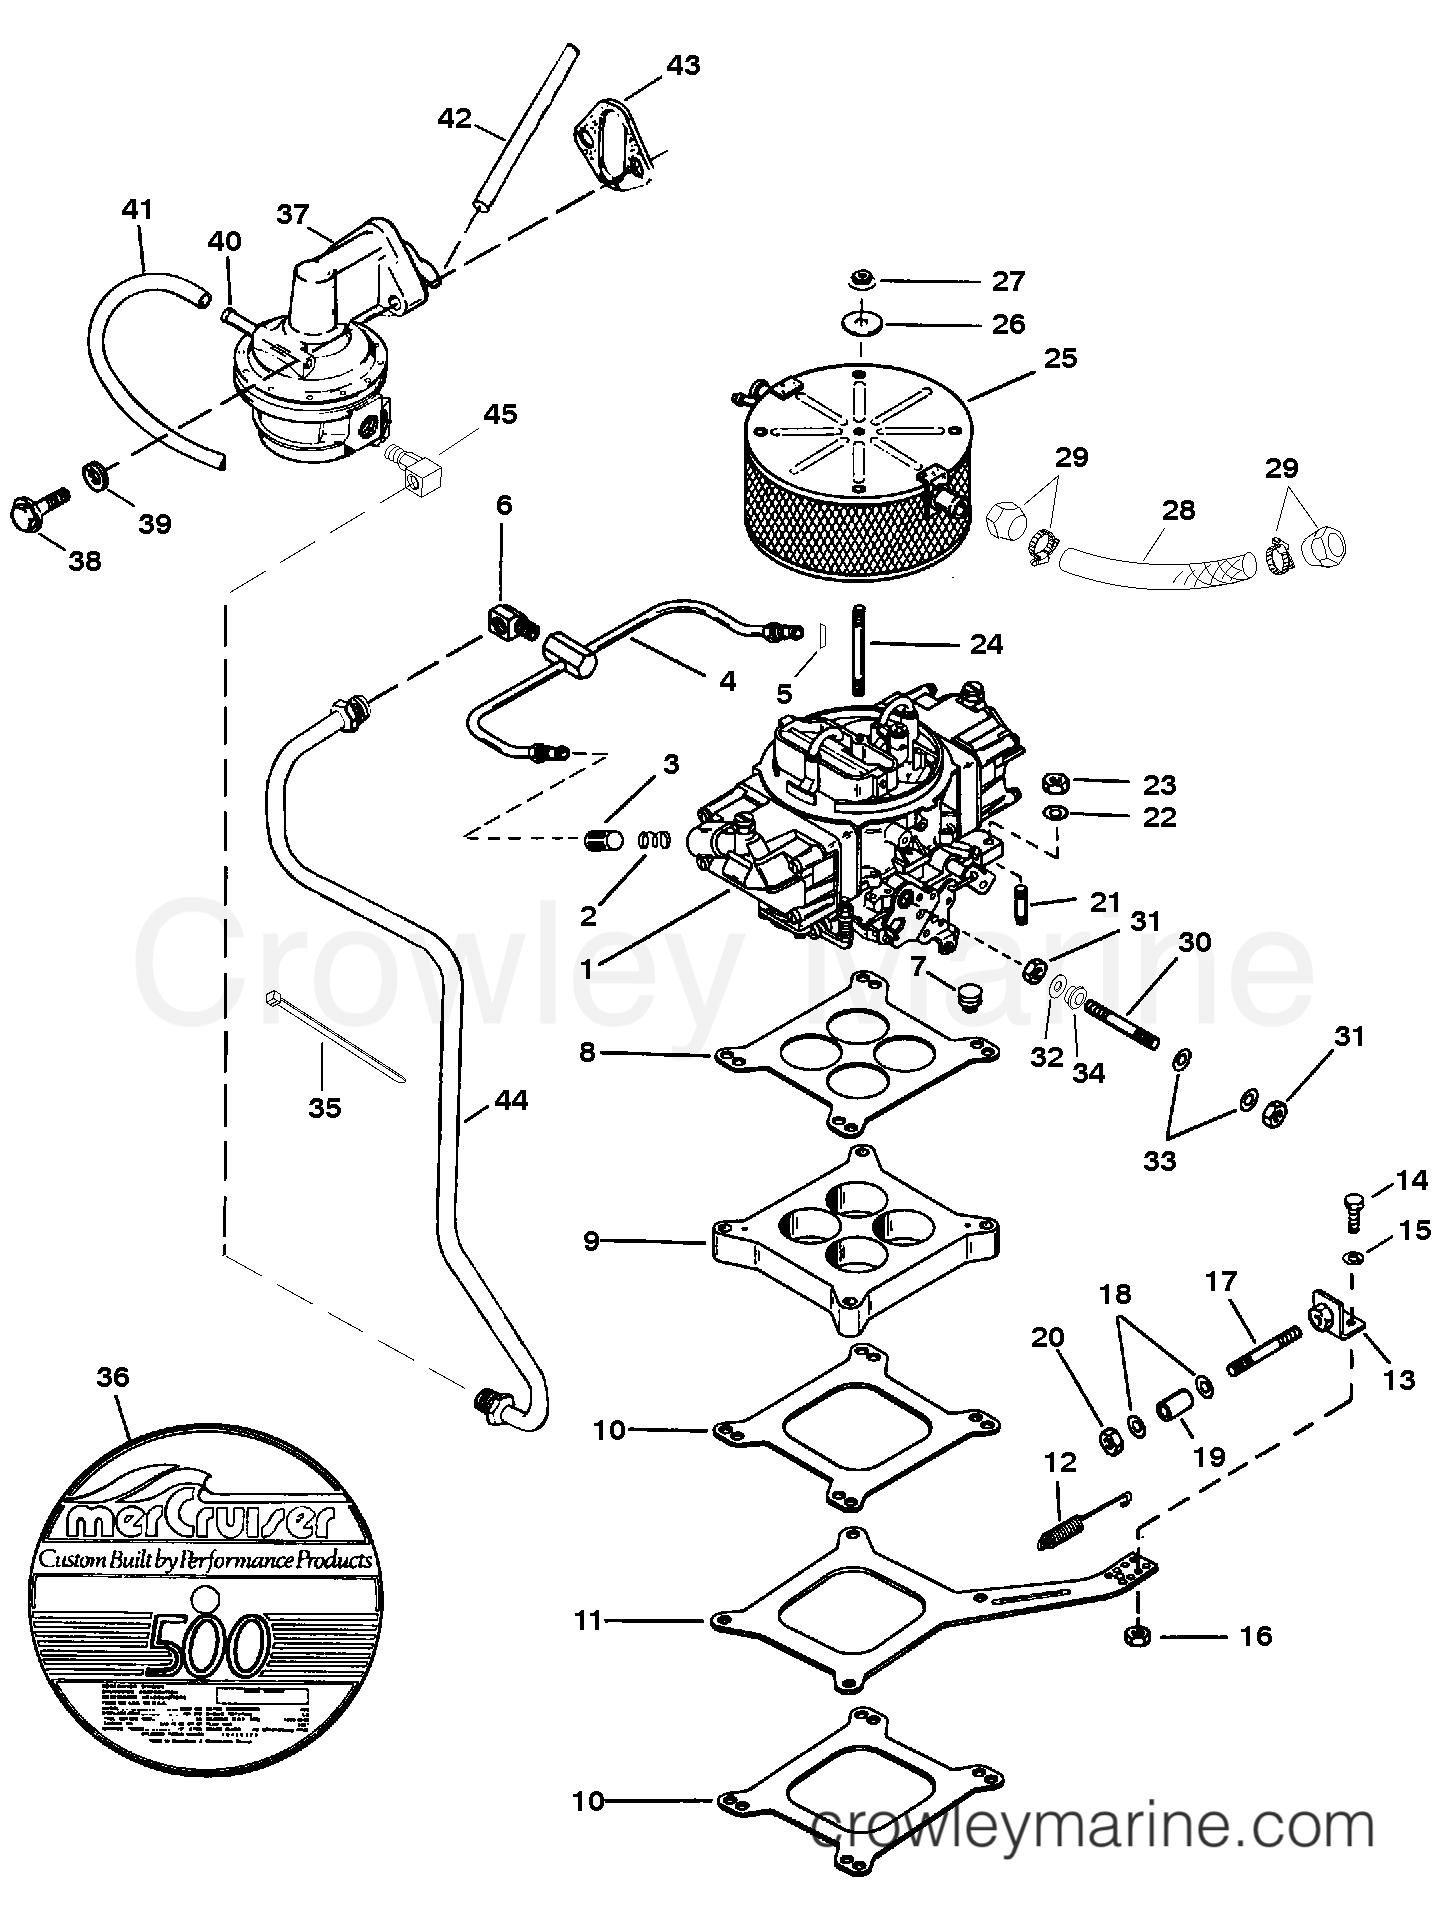 1992 Mercruiser Race Sterndrive 500 [III/IV] - 4500440EH CARBURETOR AND LINKAGE (SERIAL # 0F615762 THRU 0F745405) section